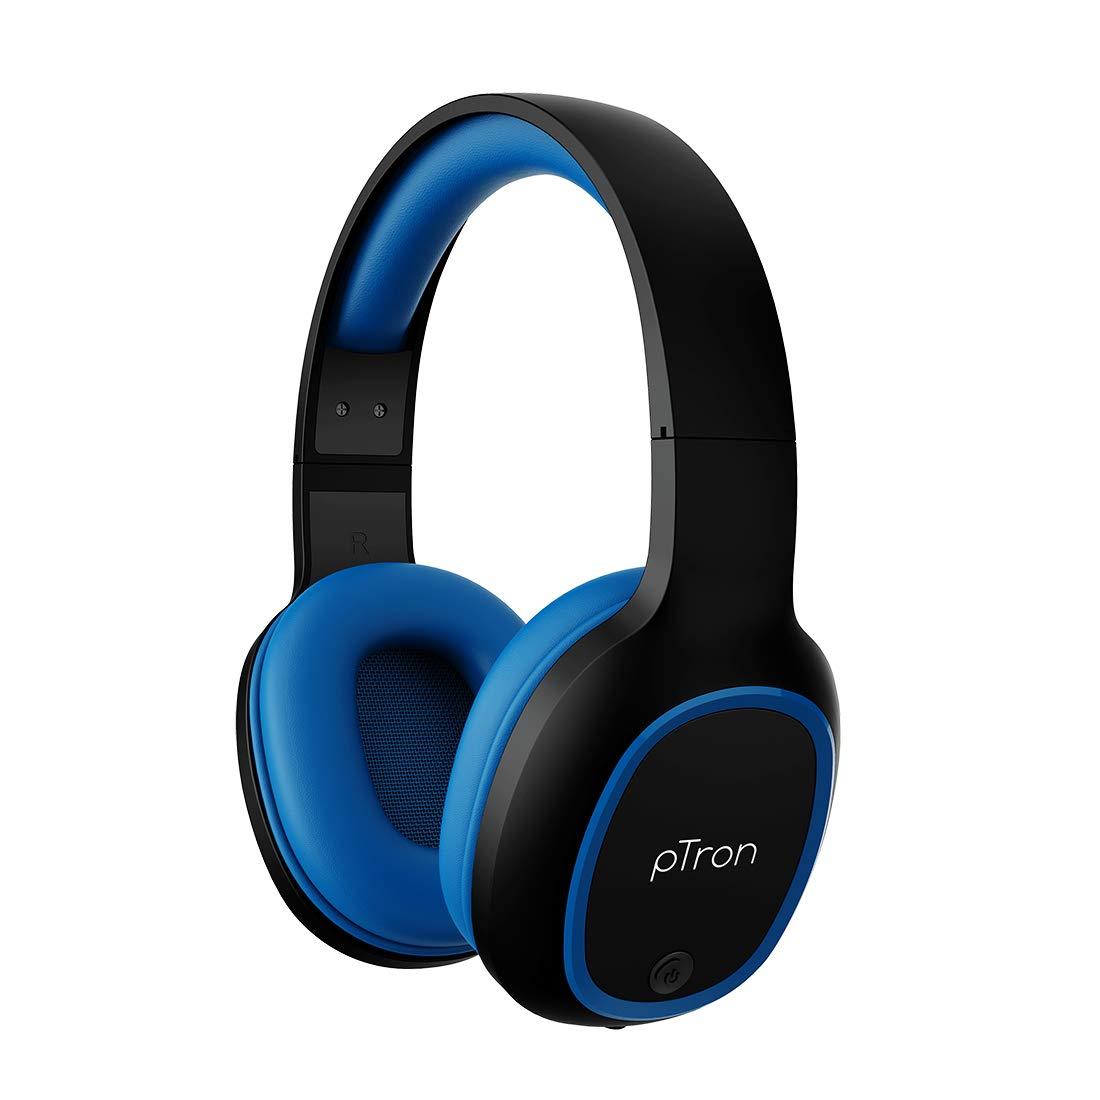 PTron Studio Over-Ear 5.0 Bluetooth Wireless Headphones $10.9 Coupon